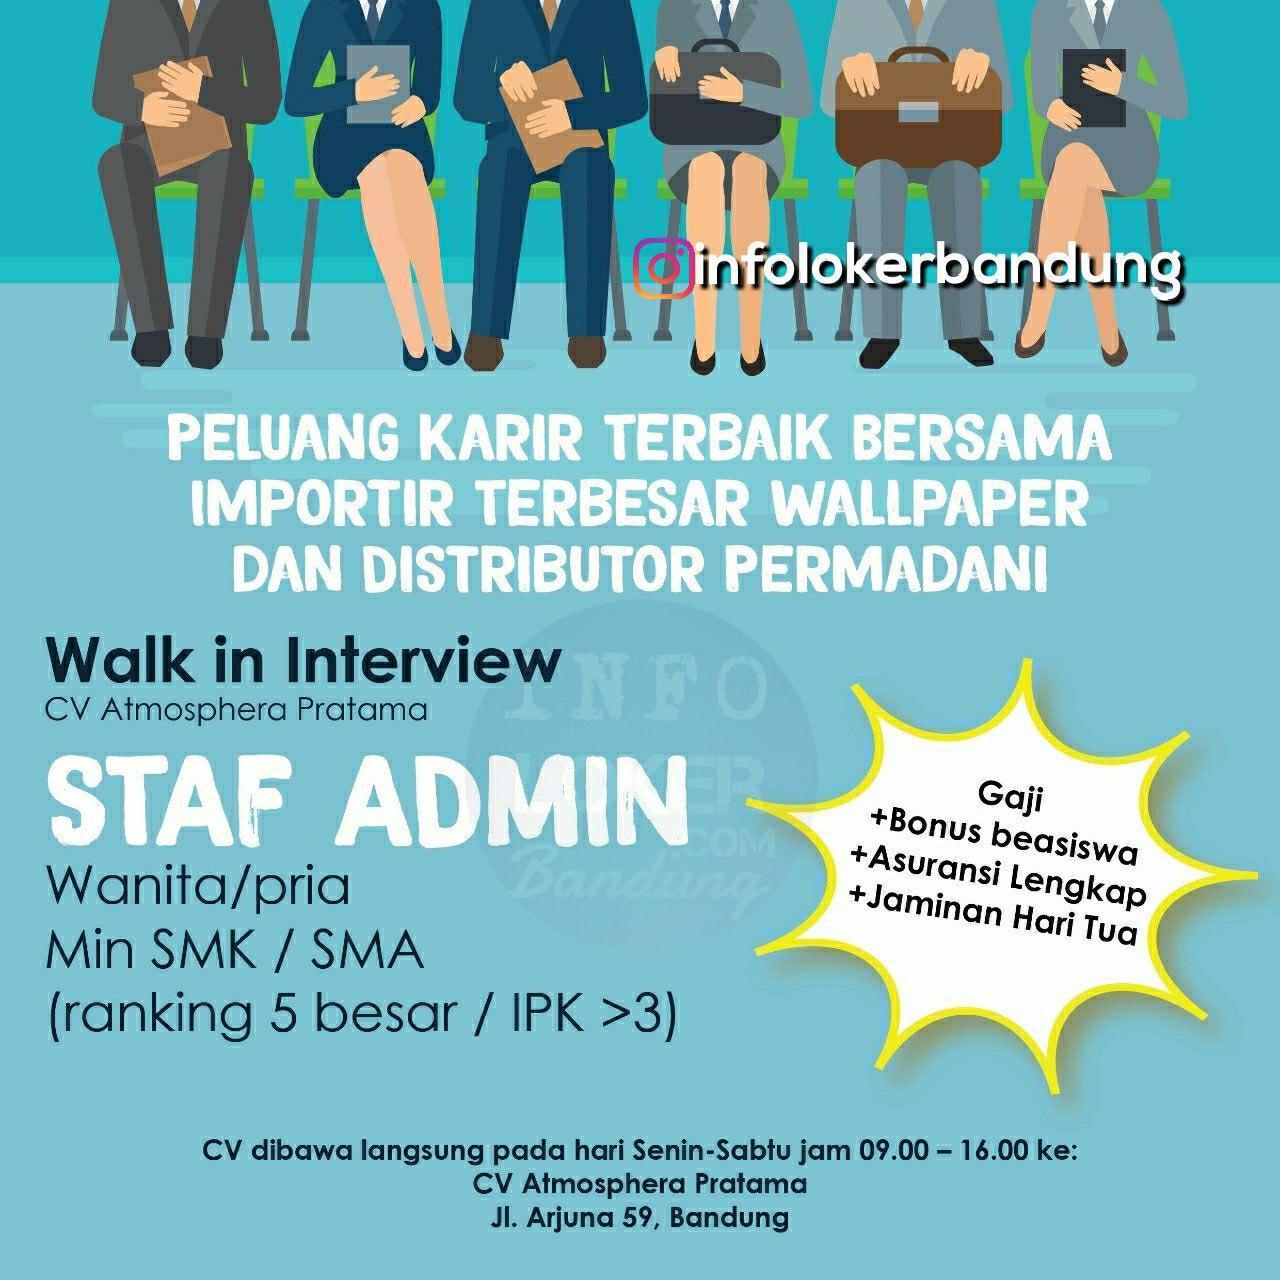 Lowongan Kerja CV. Atmosphera Pratama ( Walk In Interview ) Bandung November 2018